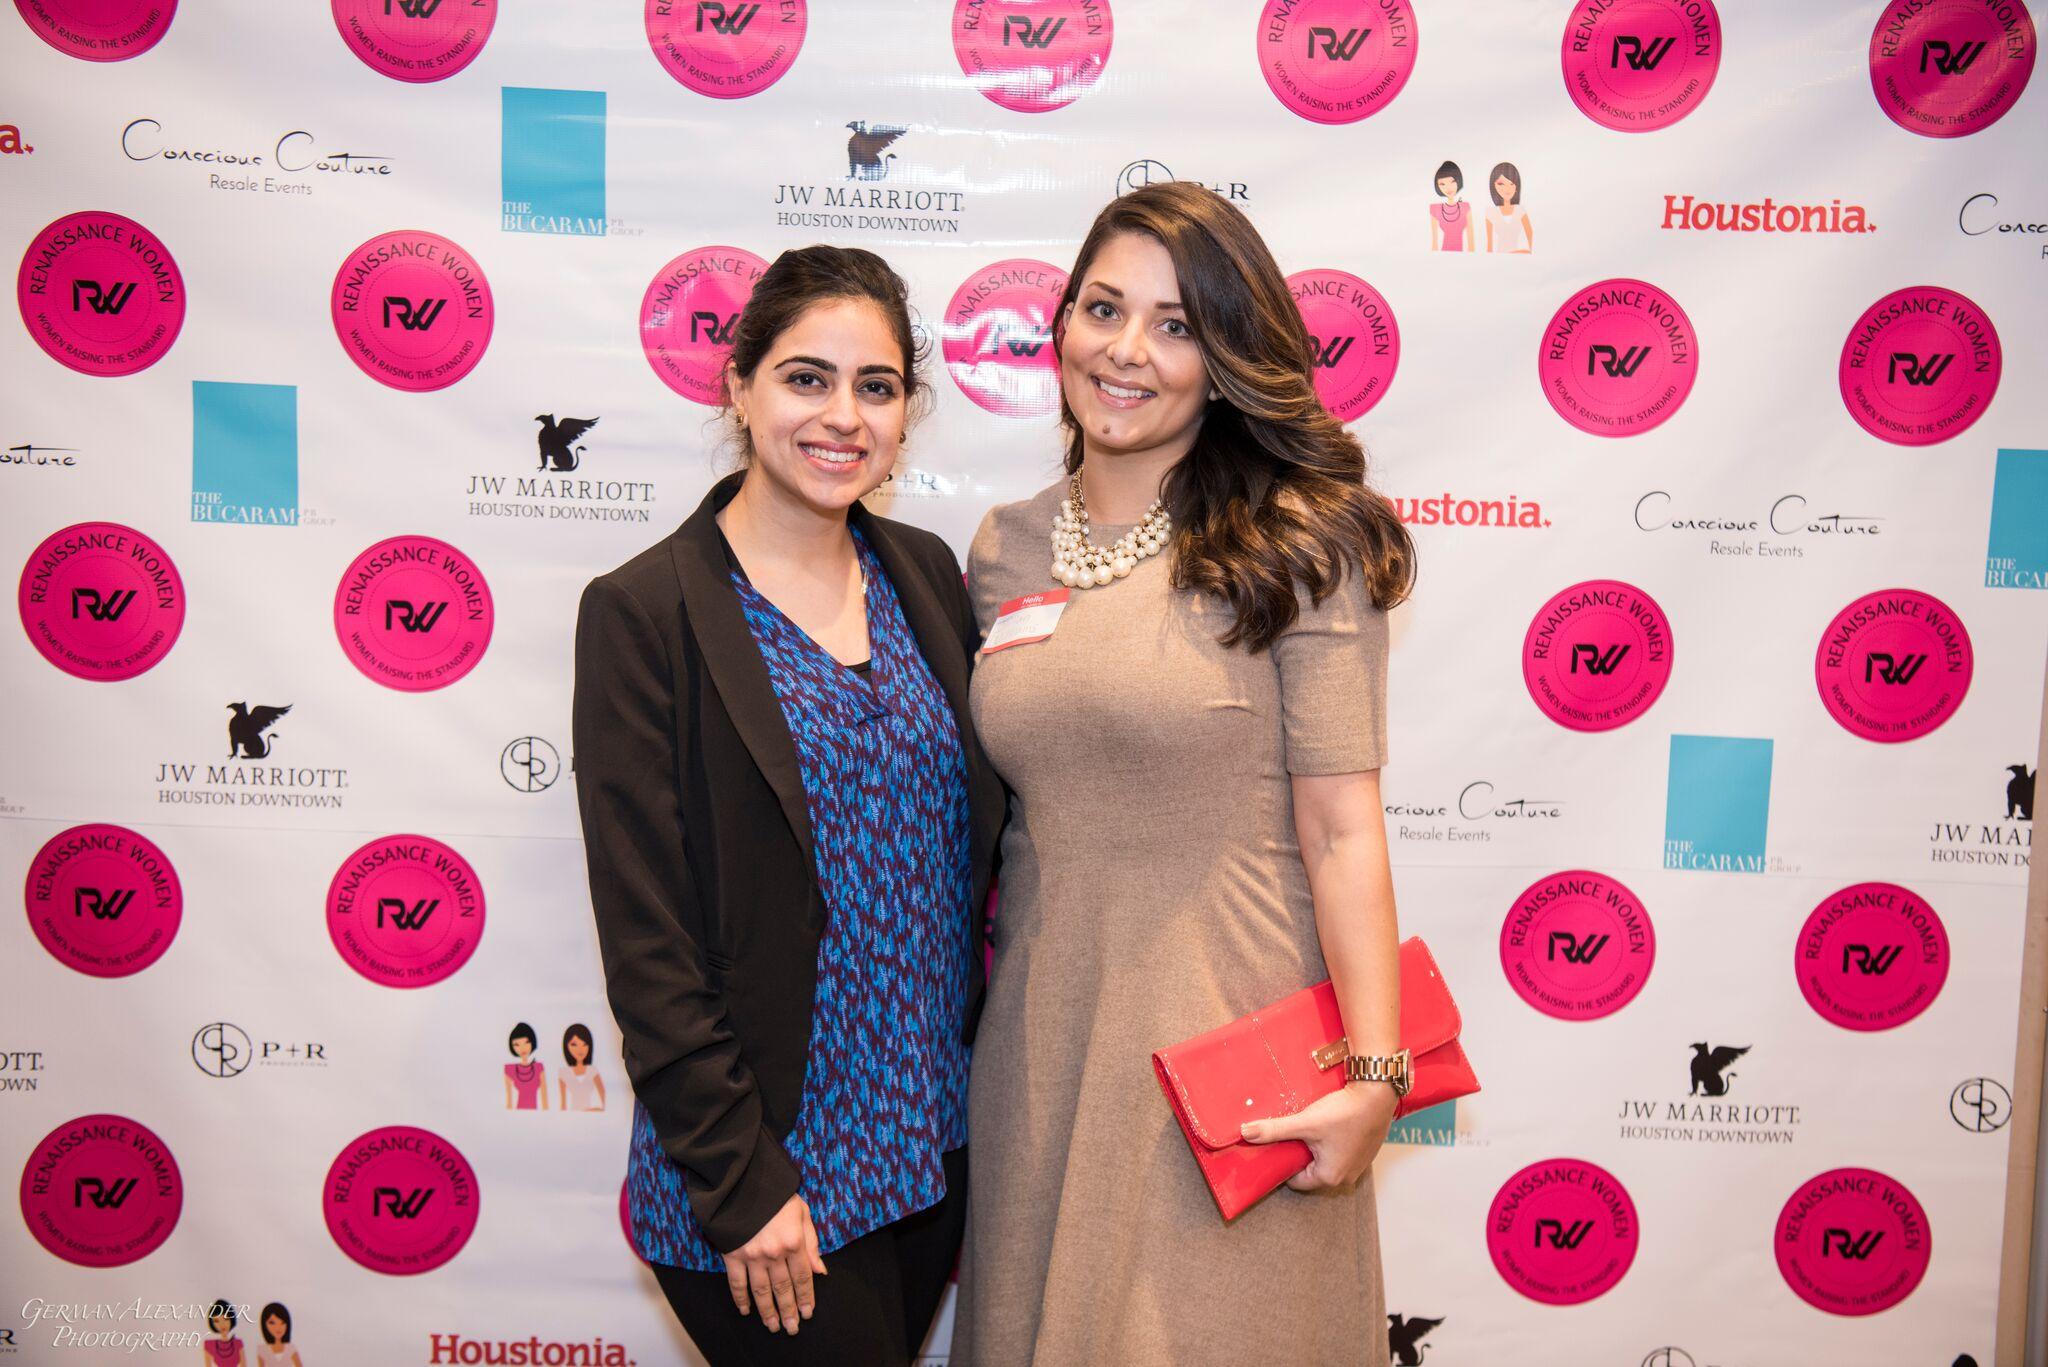 Riya Madhyani and Jillian Williams